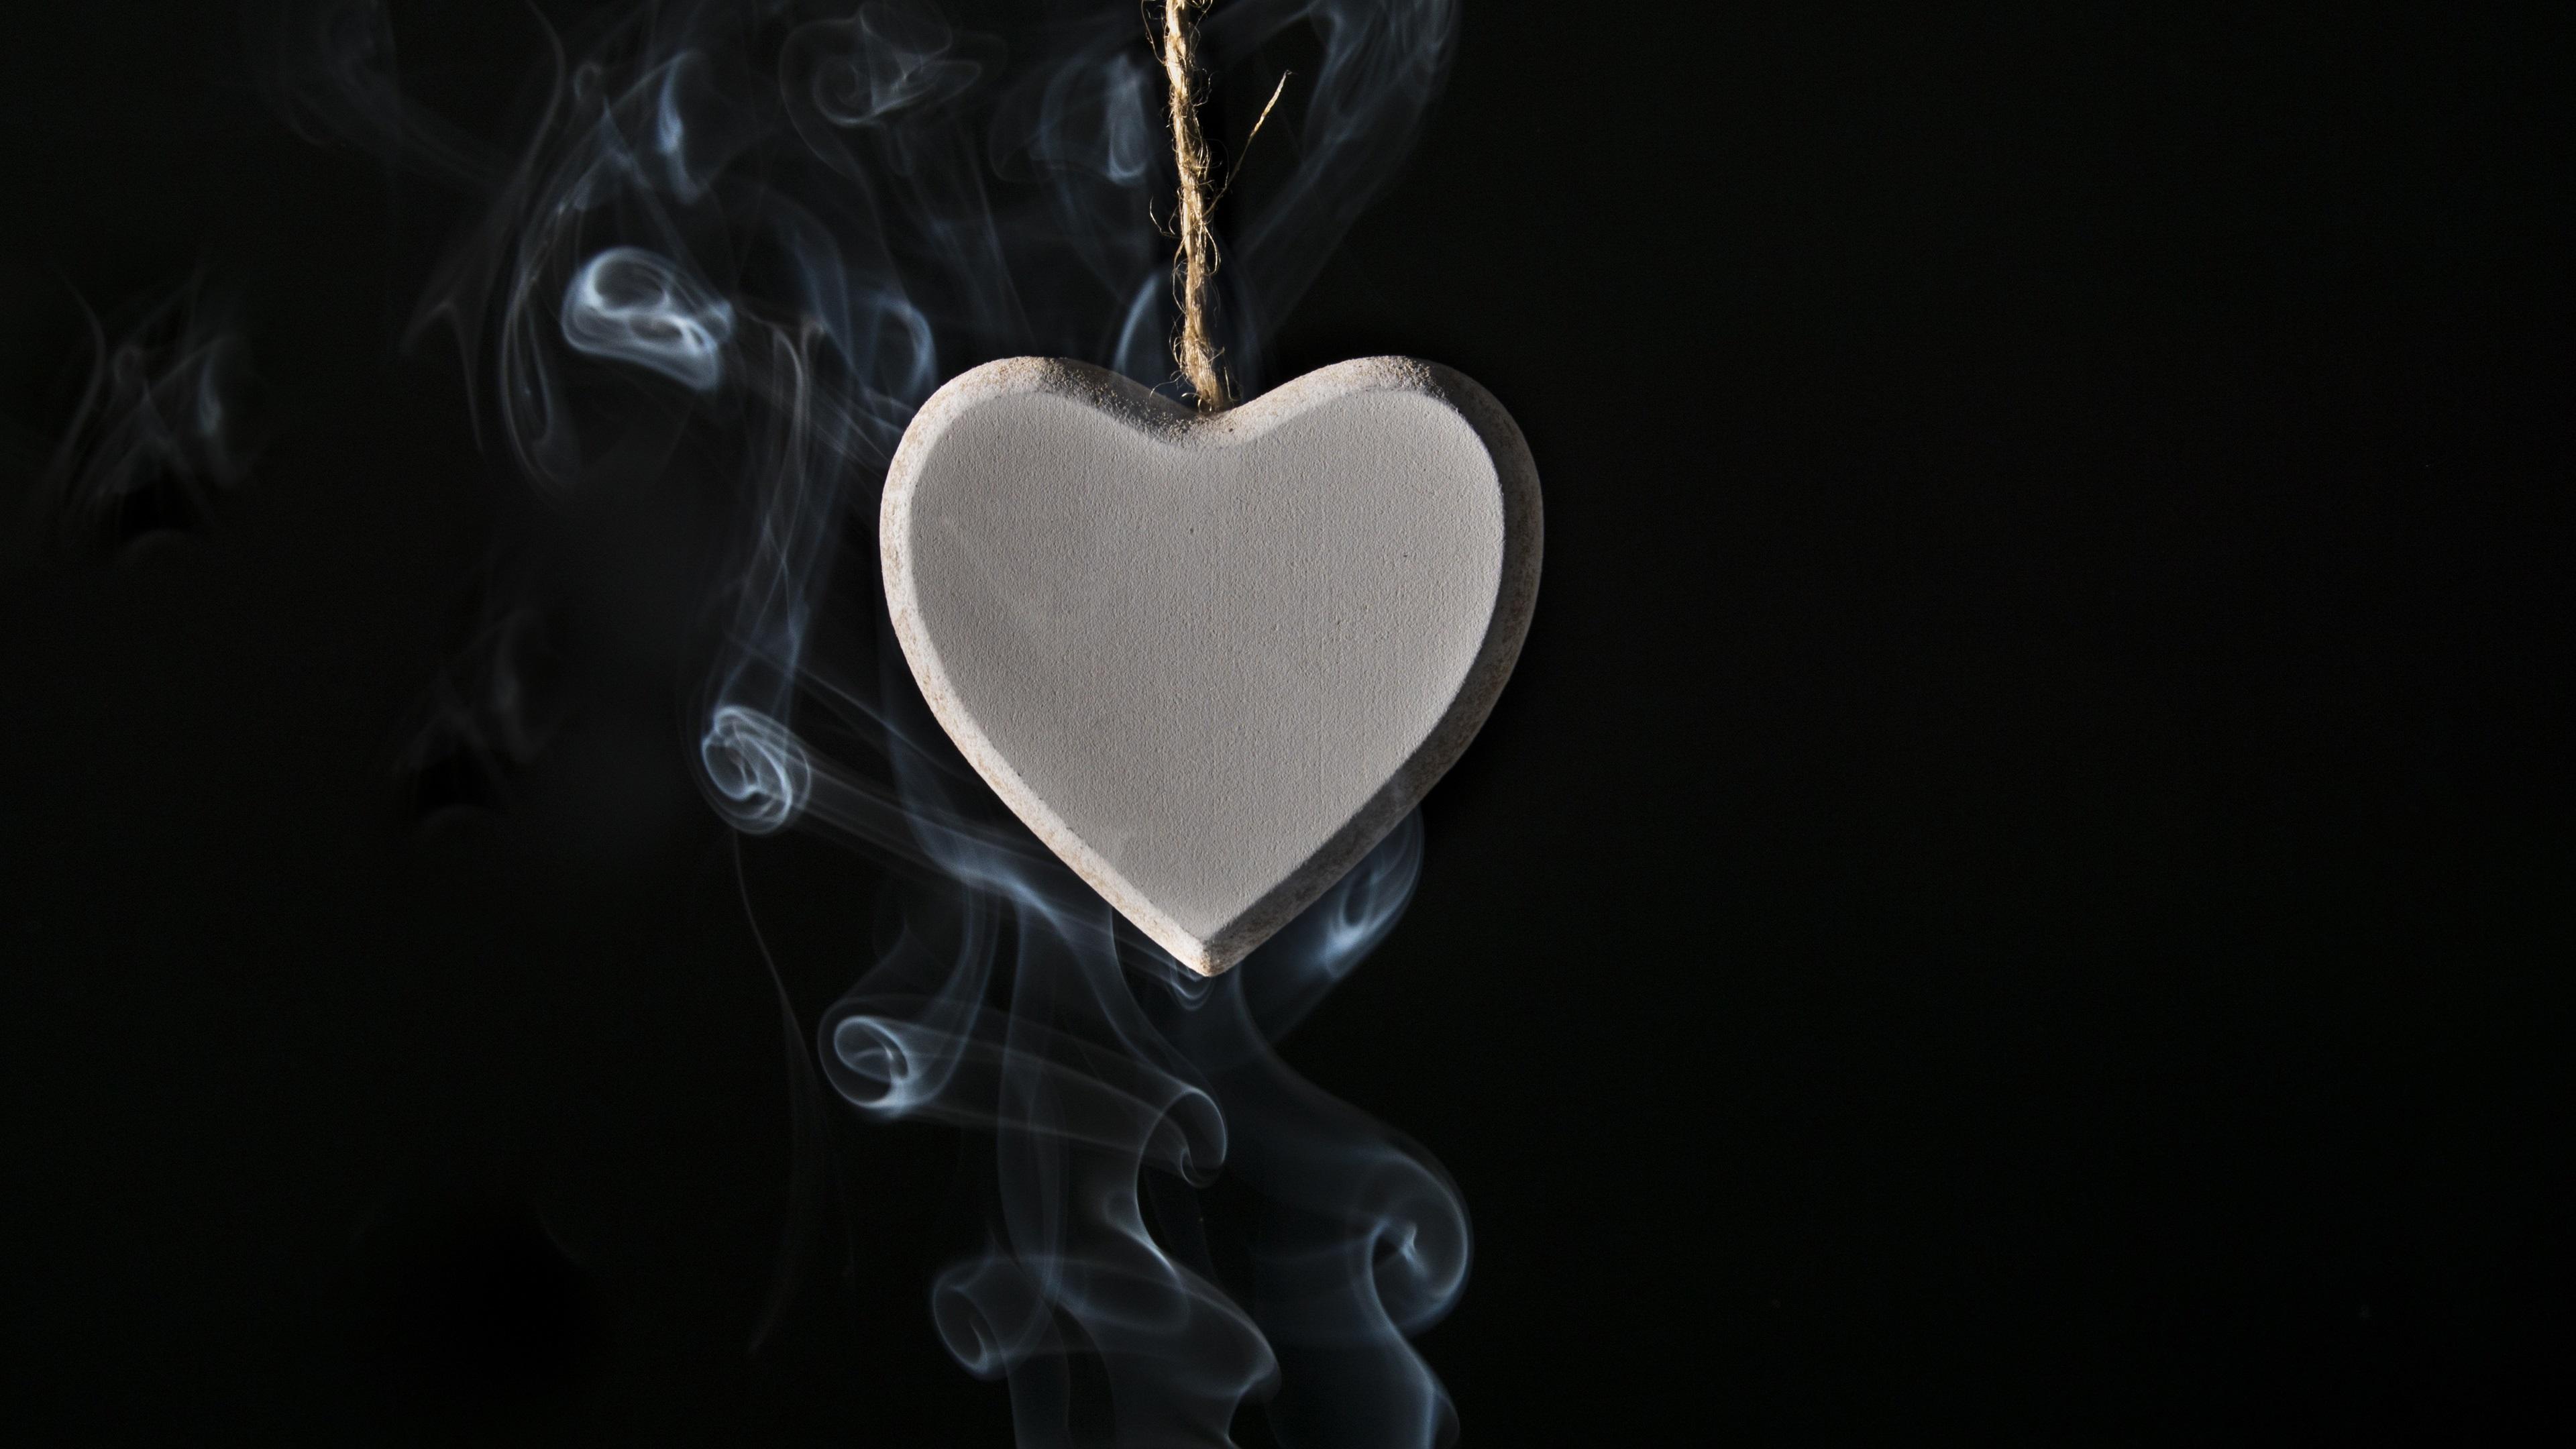 Love Wallpaper Uhd : Download Wallpaper 3840x2160 Love heart pendant, smoke, black background UHD 4K Background